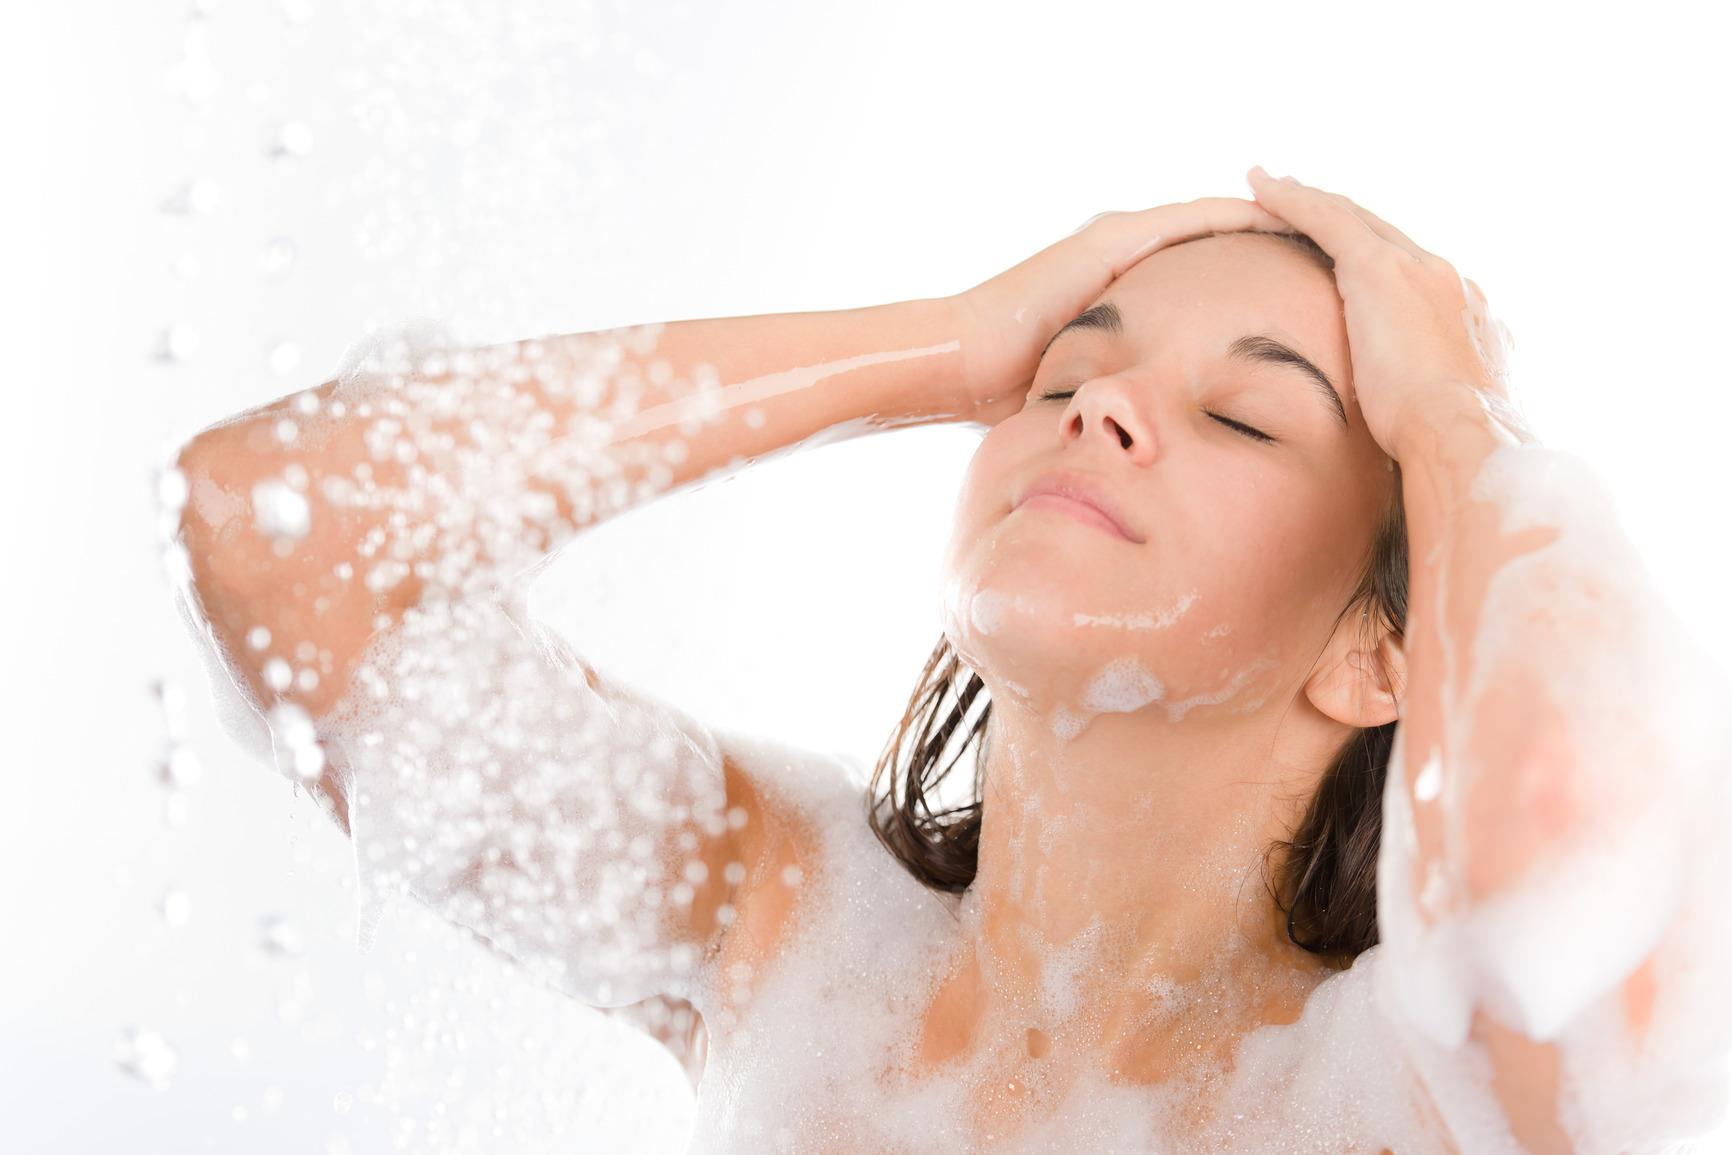 Young woman enjoy shower